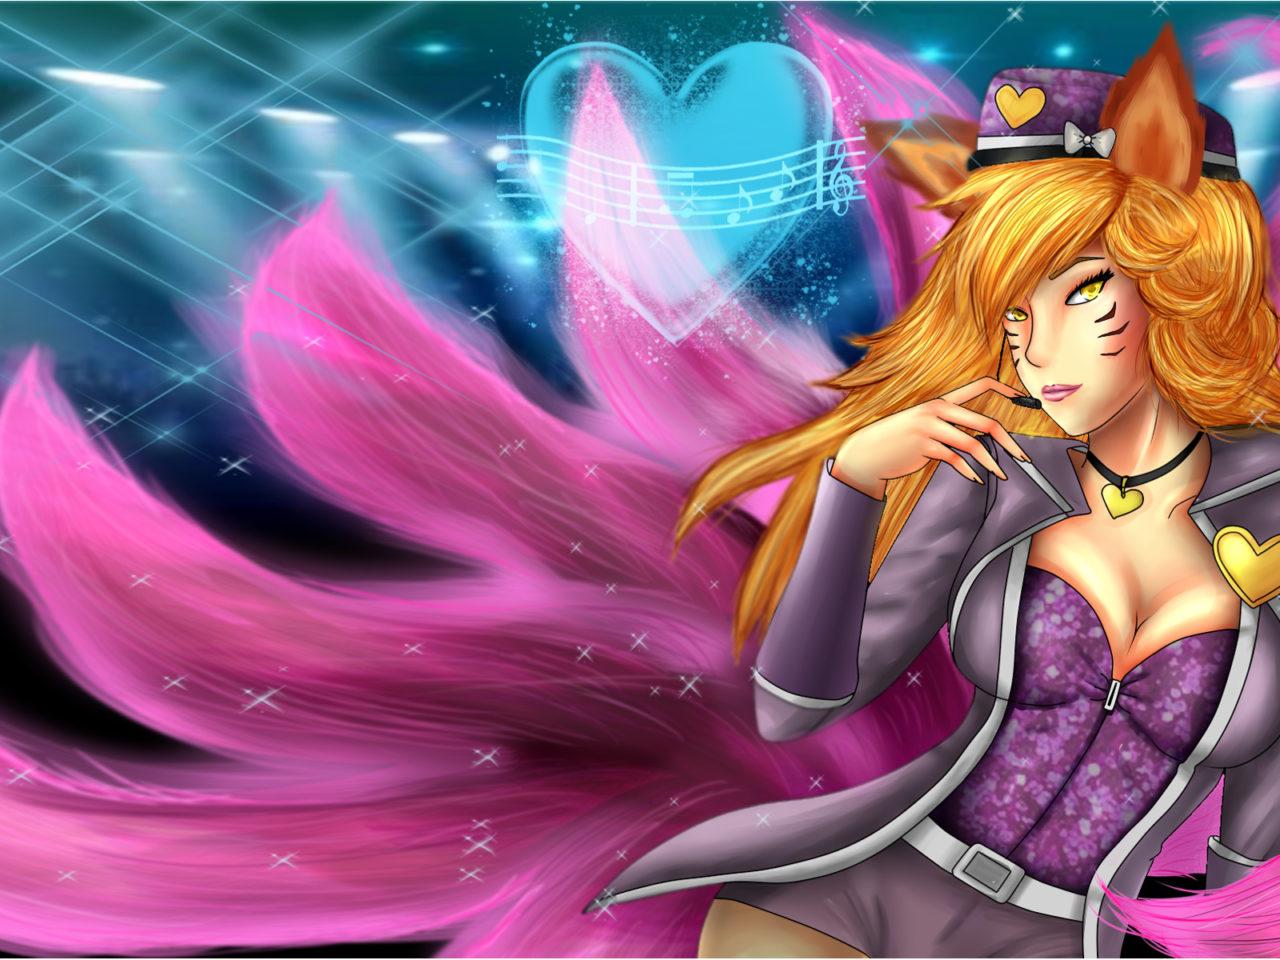 Girl With Spear Wallpaper Popstar Ahri By Solspear On Deviant Art Wallpaper Hd